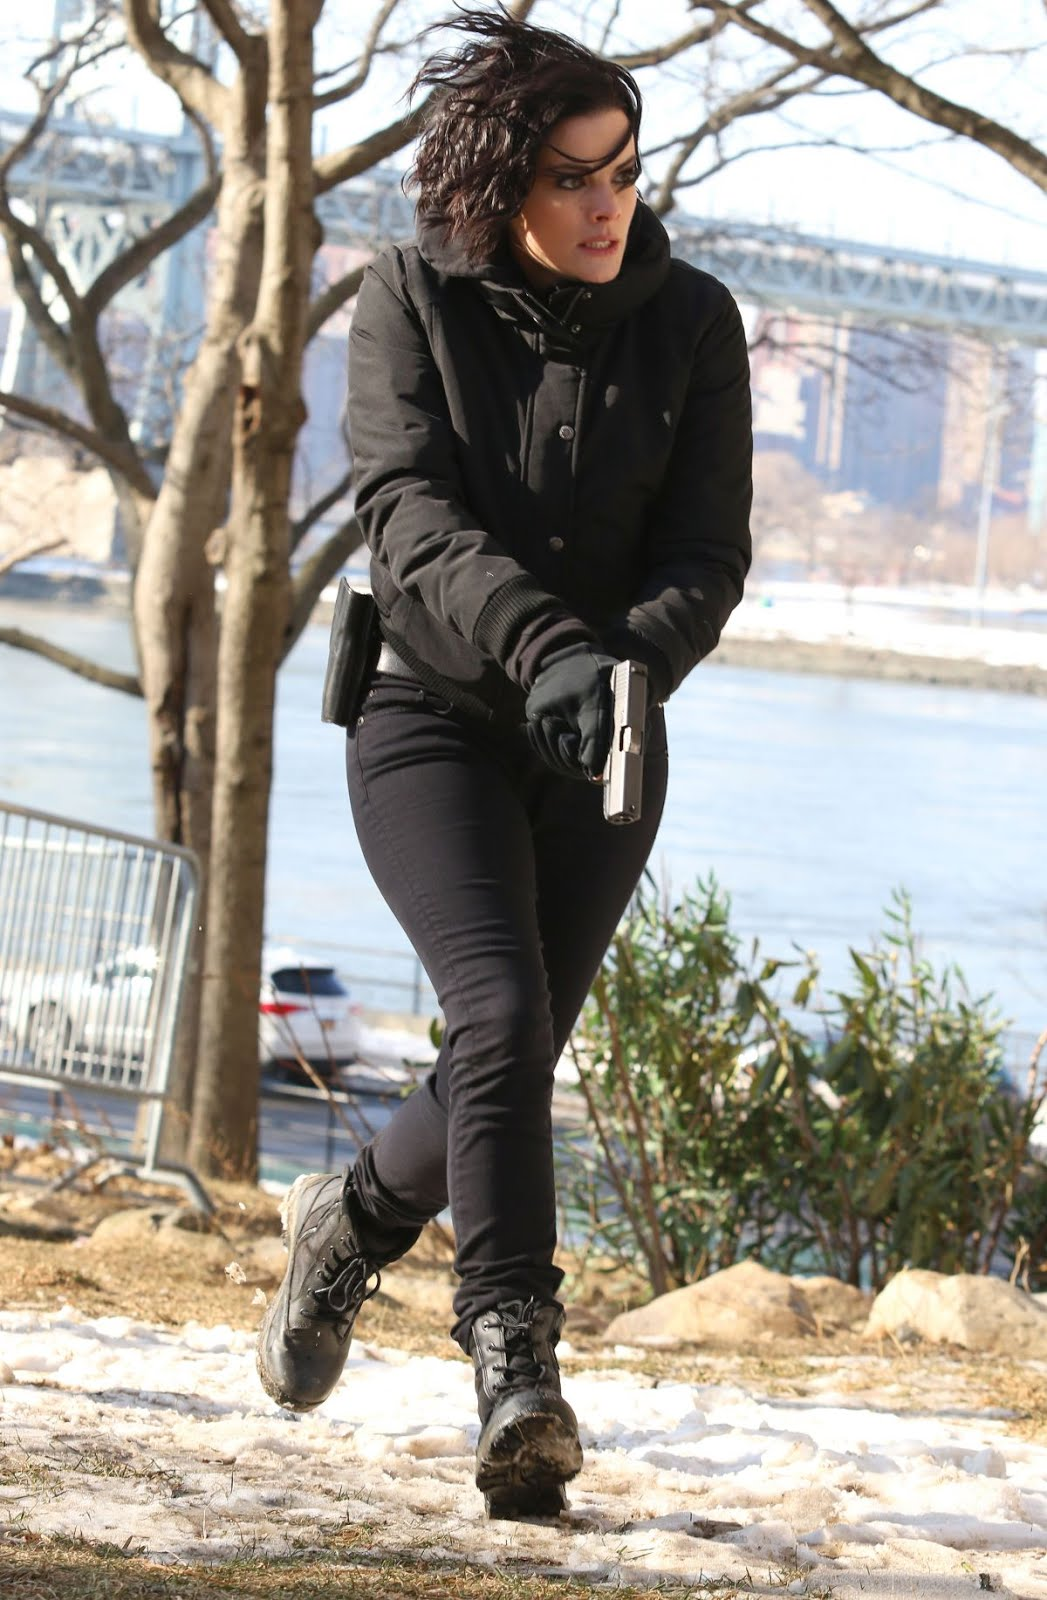 Jaimie Alexander On The Set Of Blindspot In Astoria Park In New York 2018